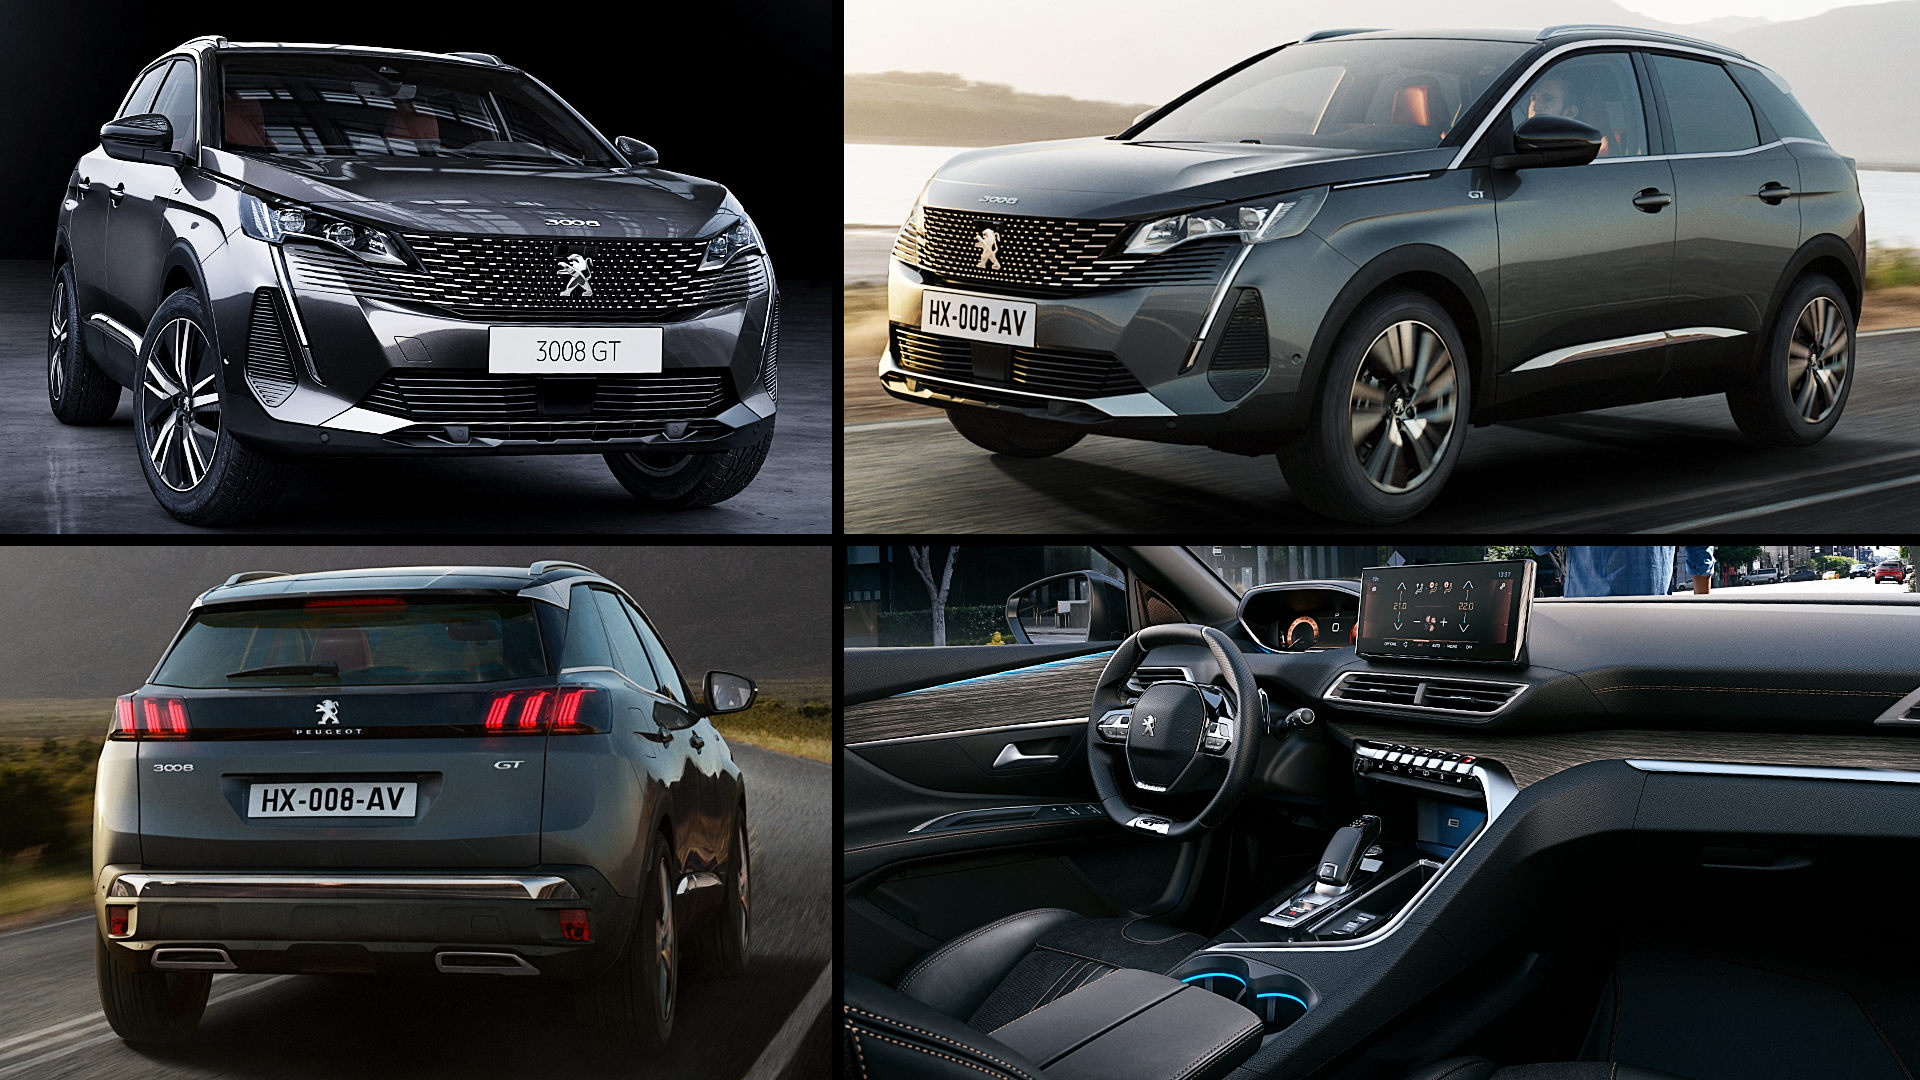 2021 Peugeot 3008 GT Black SUV